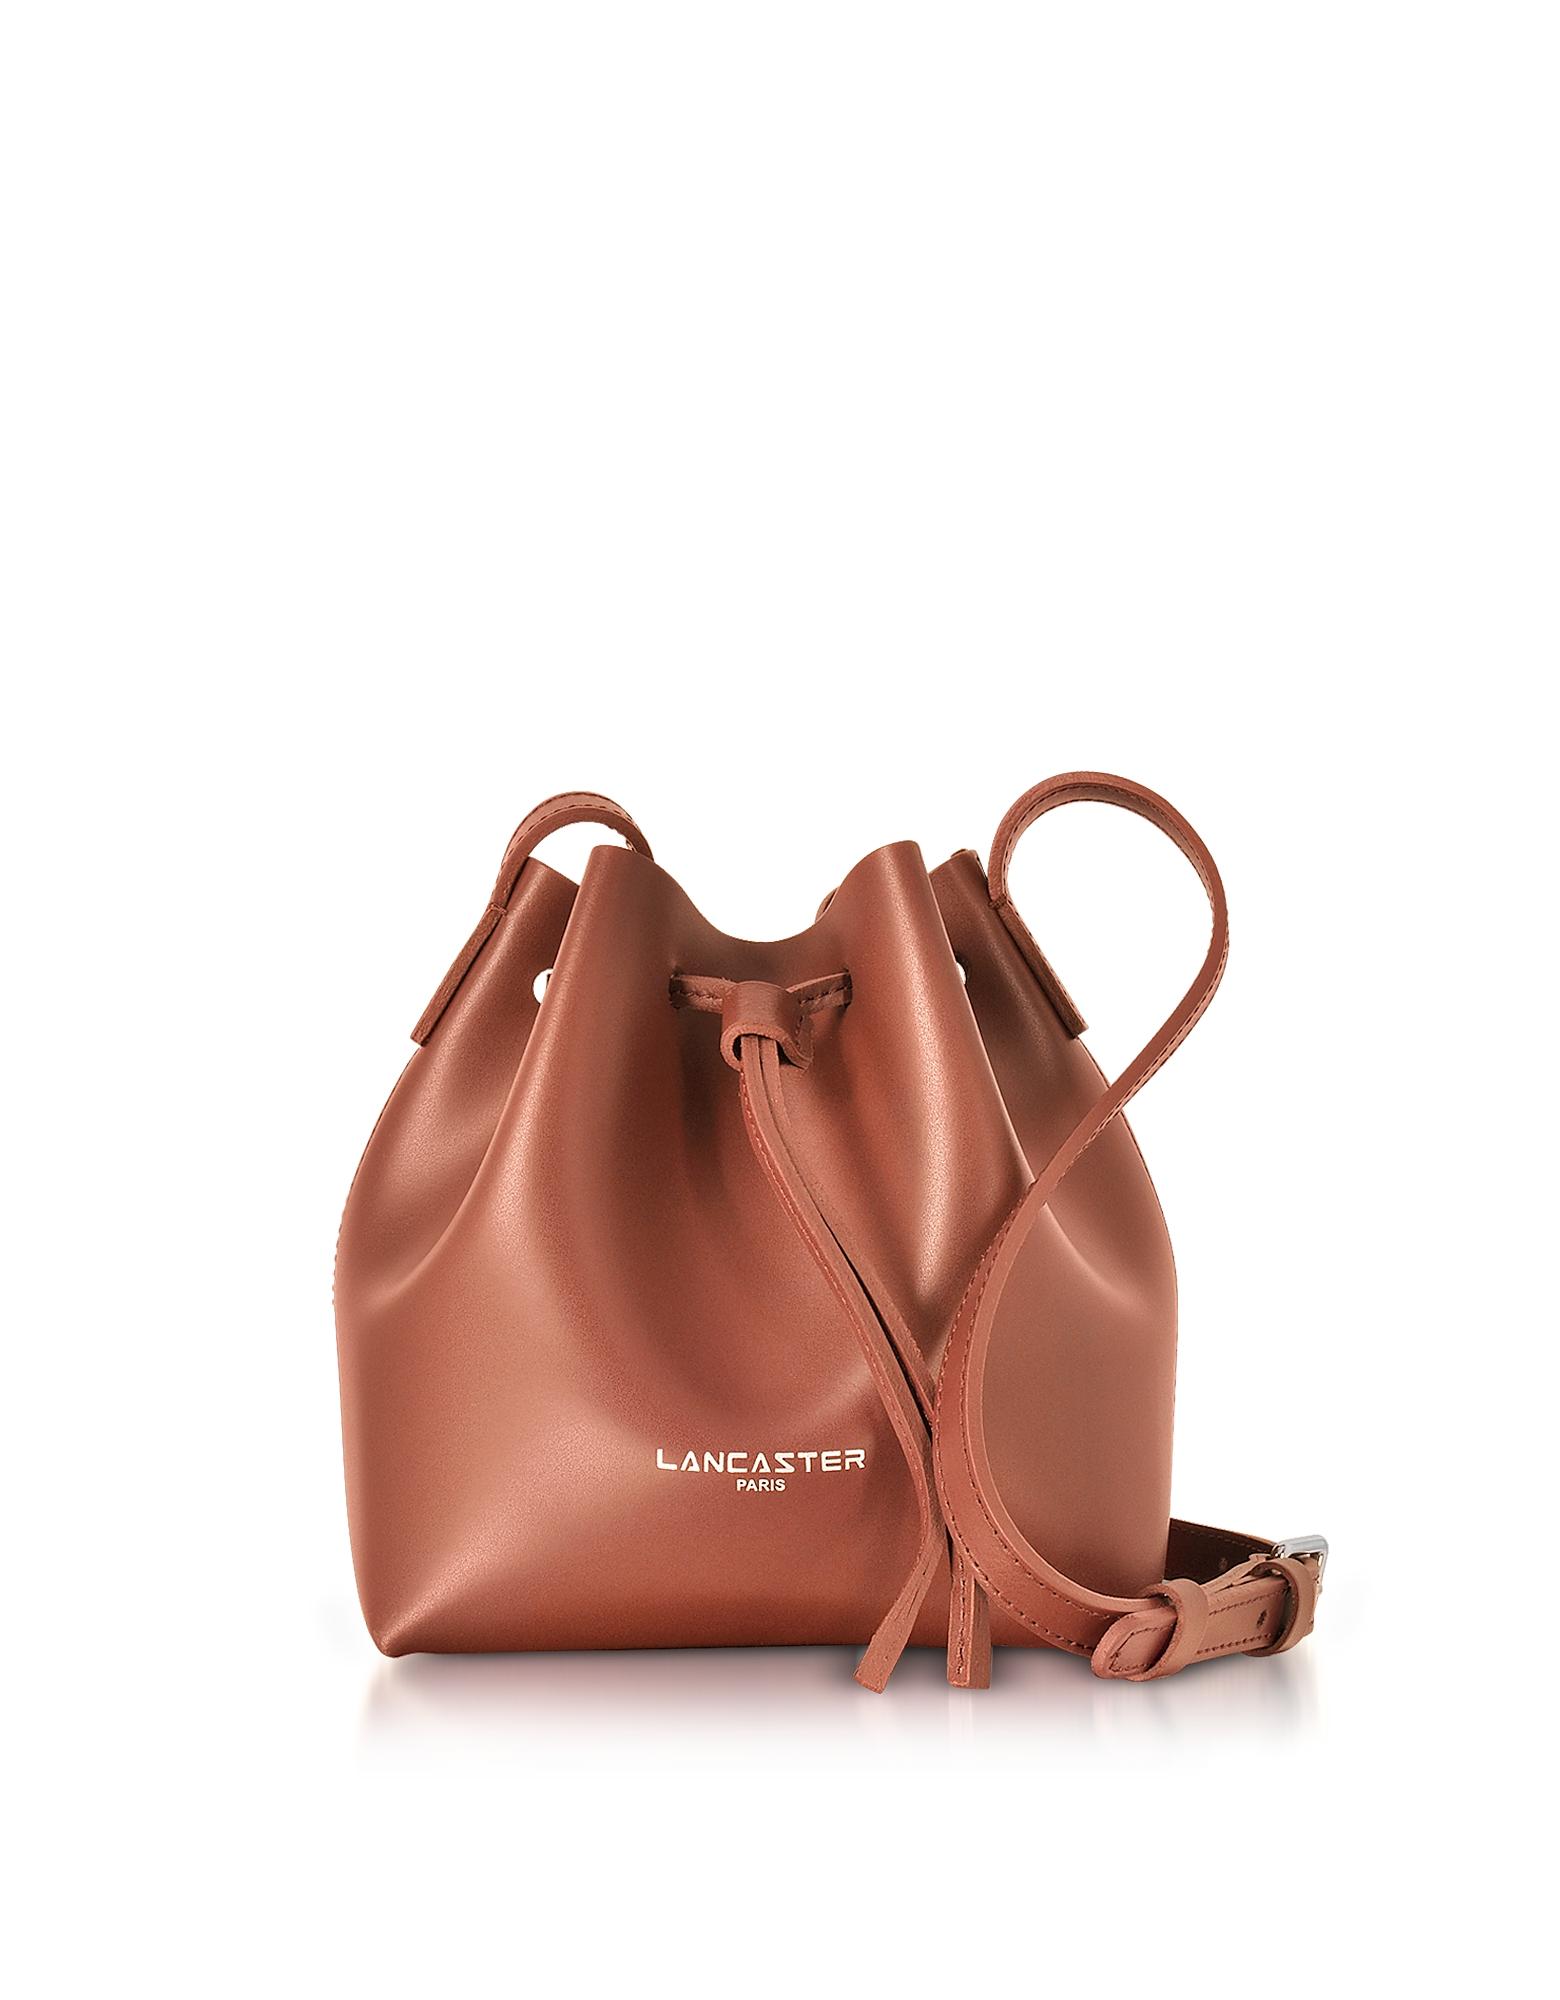 Lancaster Paris Handbags, Pur Smooth Leather Mini Bucket Bag